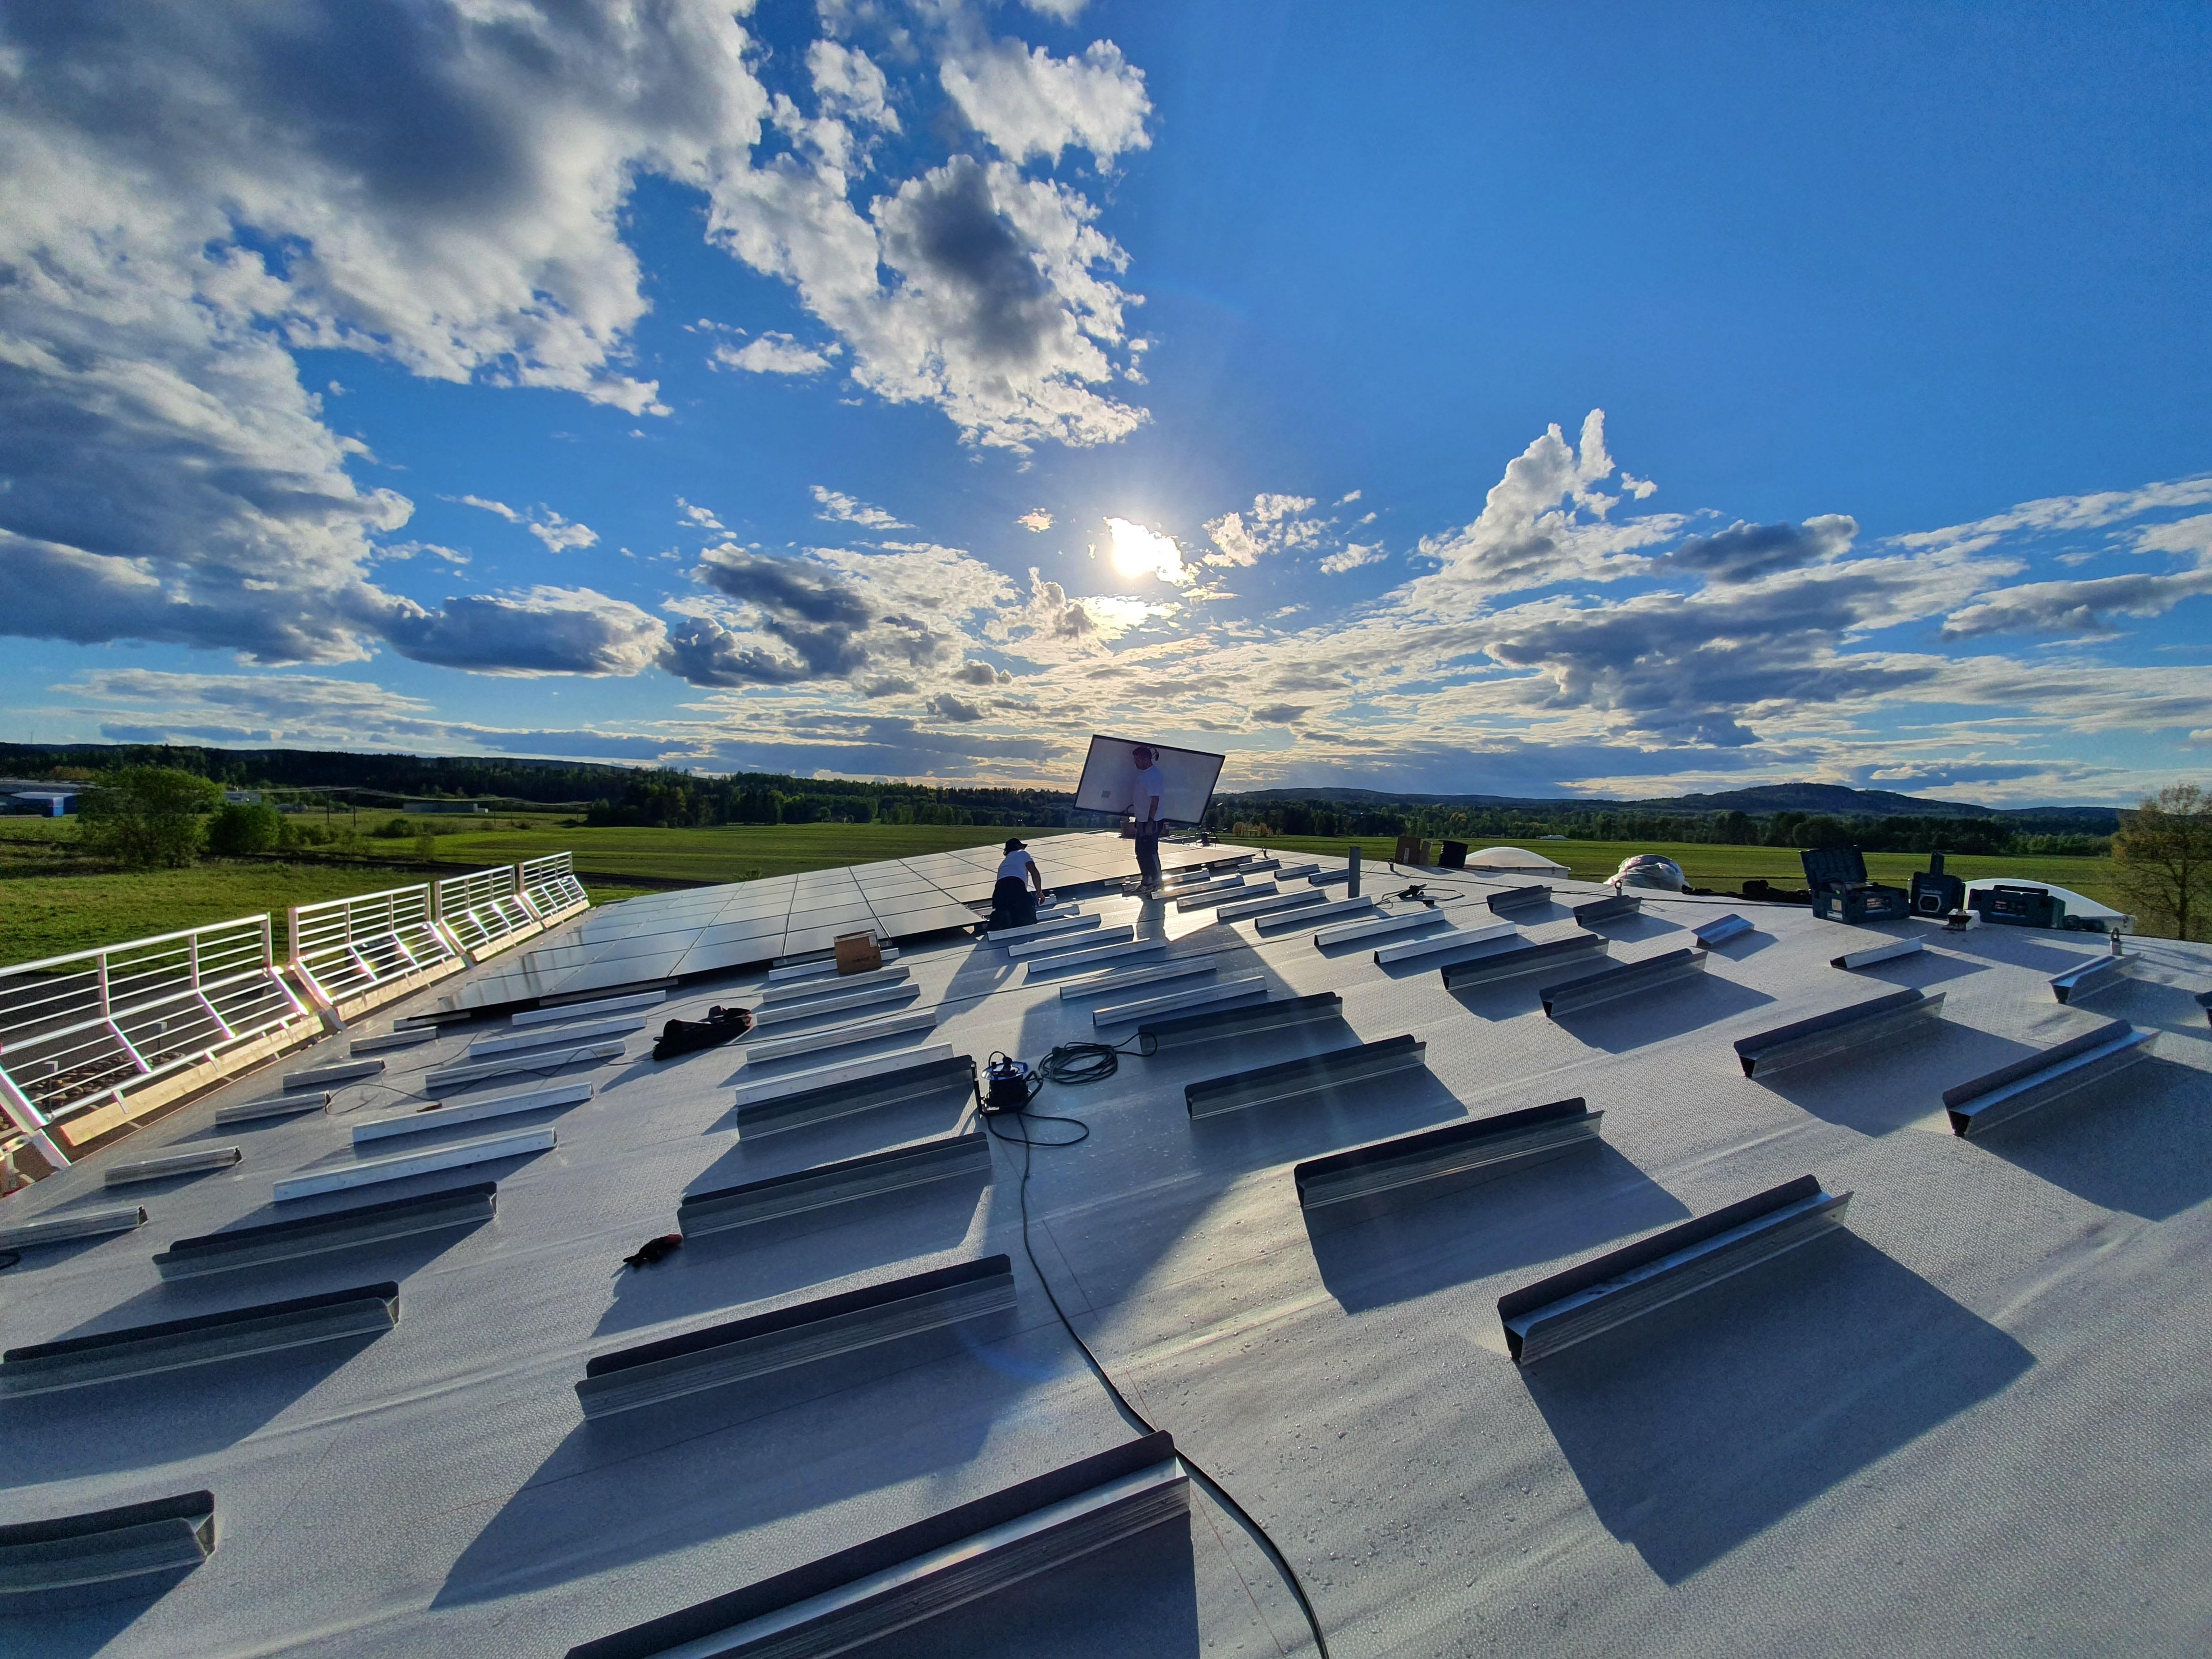 rails-welded-PVC-membrane-installation-solar-panels